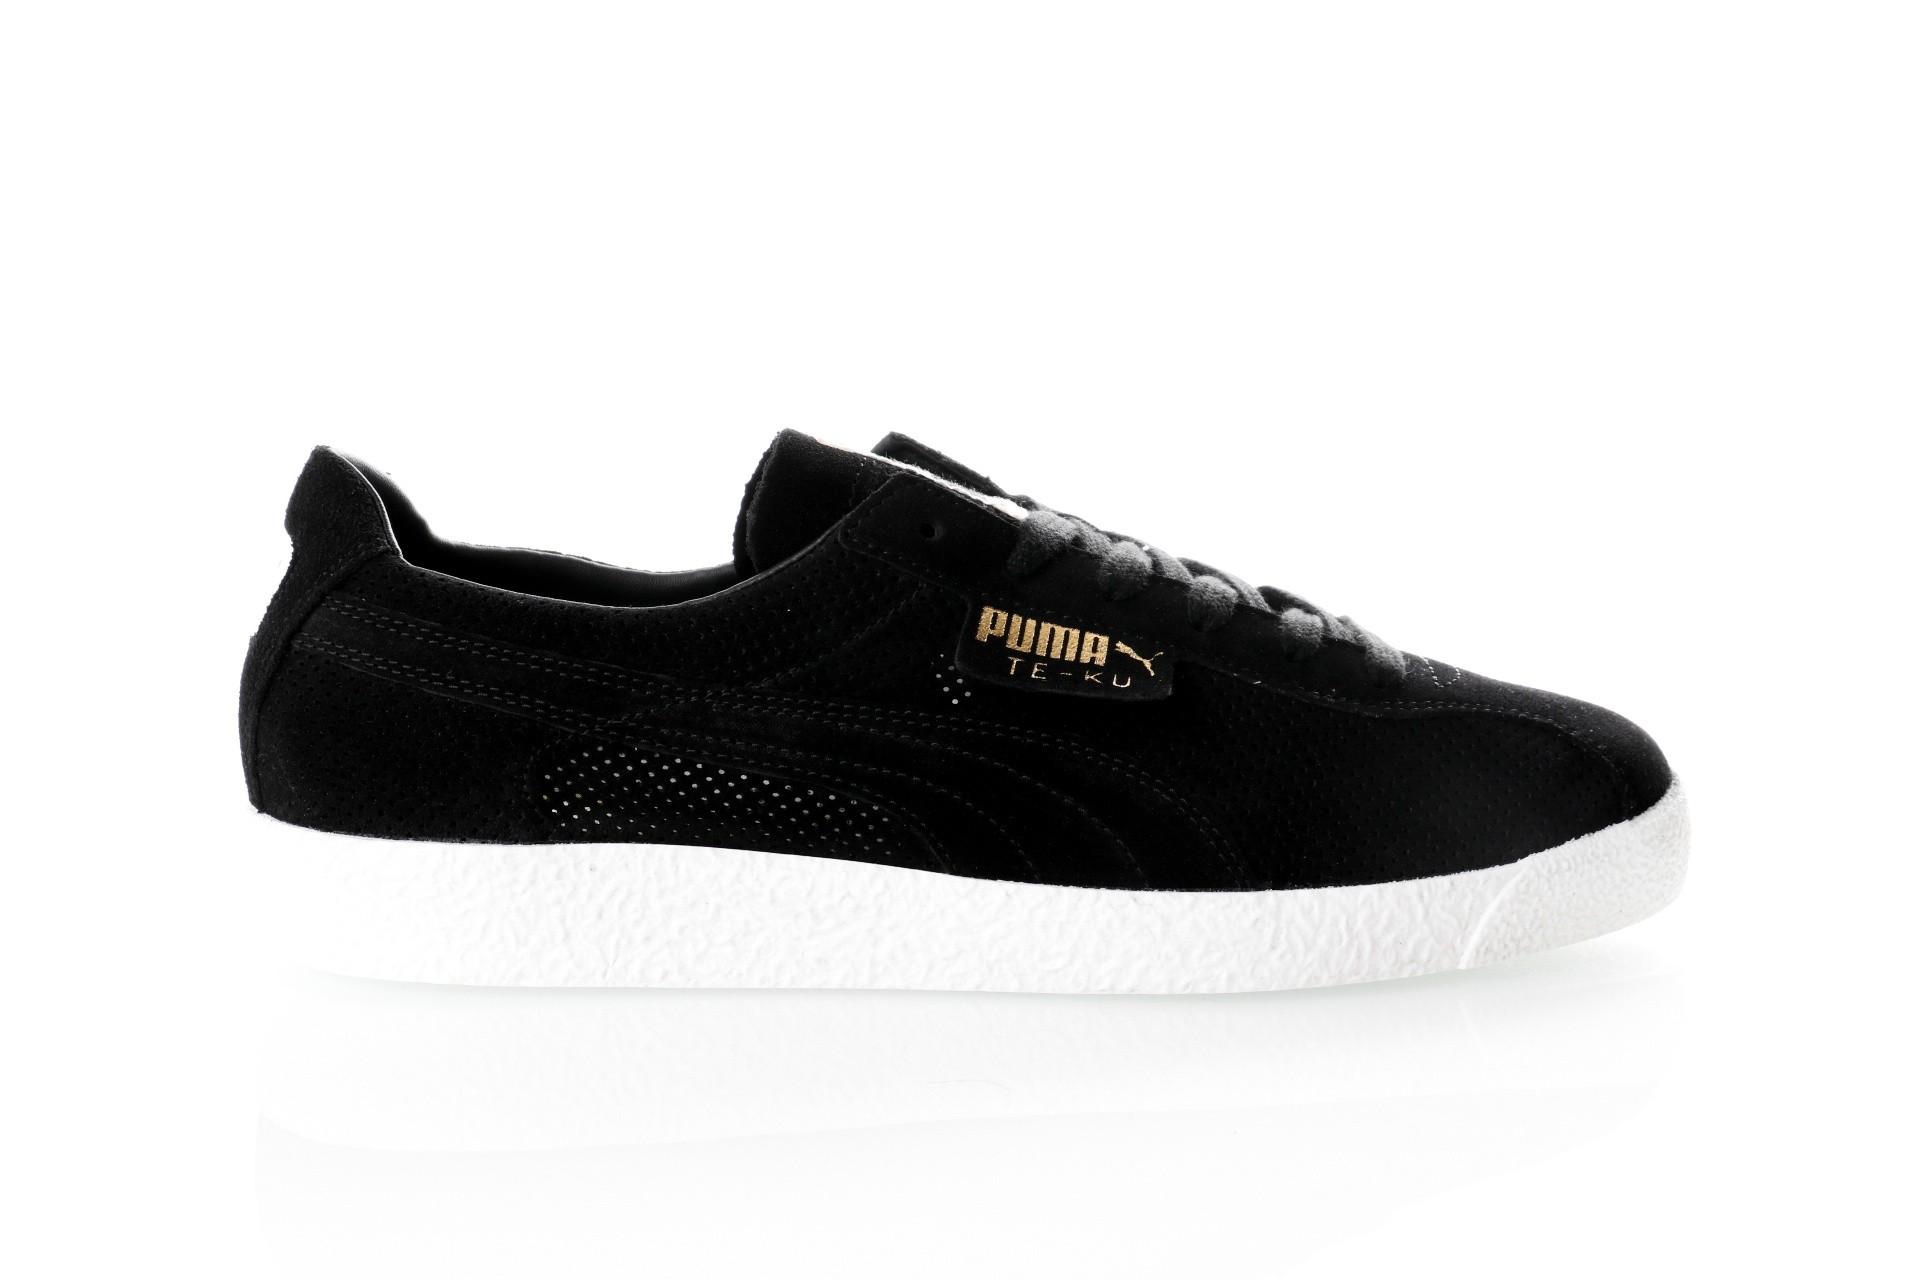 Foto van Puma Te-Ku Summer 365422 04 Sneakers Puma Black - Puma Black - Puma White